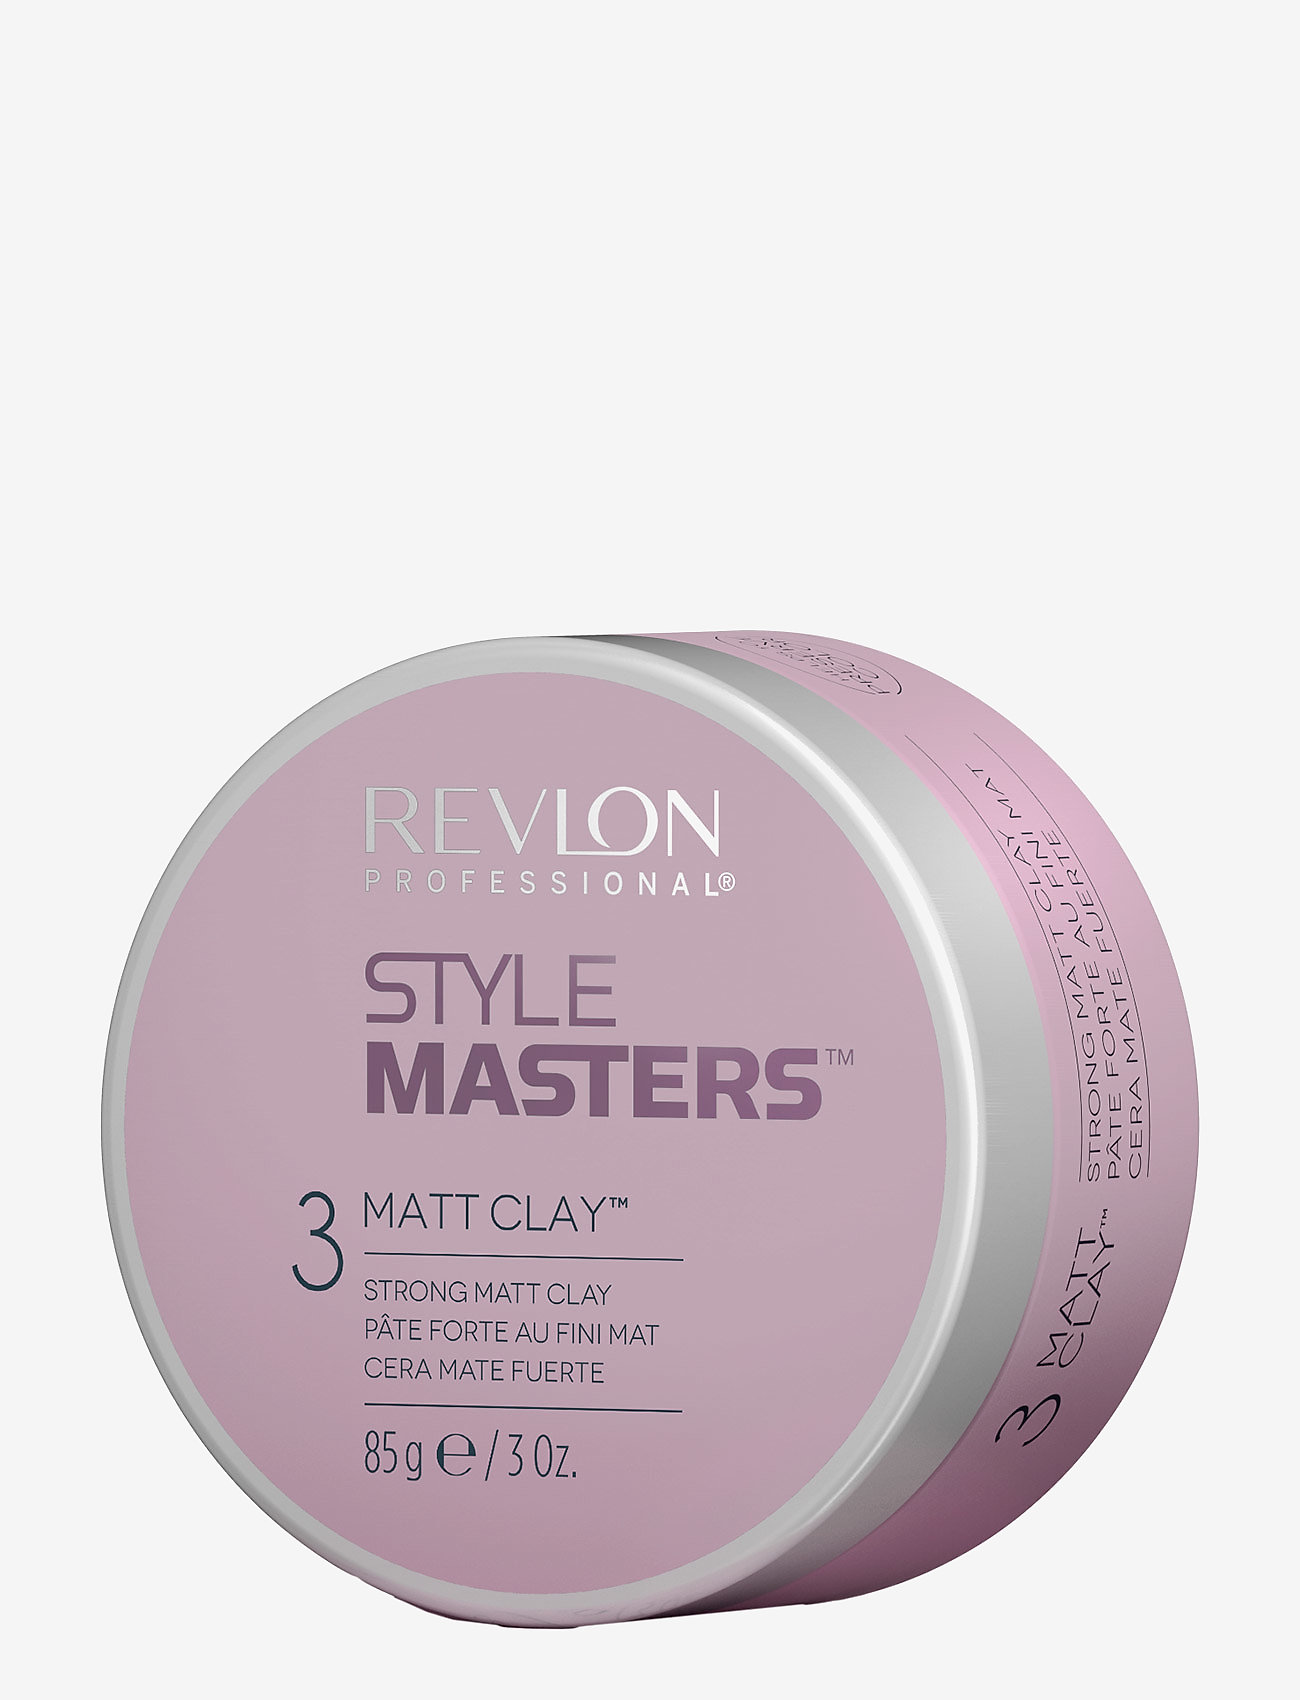 Revlon Professional - STYLE MASTERS STYLING CREATOR MATT CLAY - vahat & geelit - no color - 0